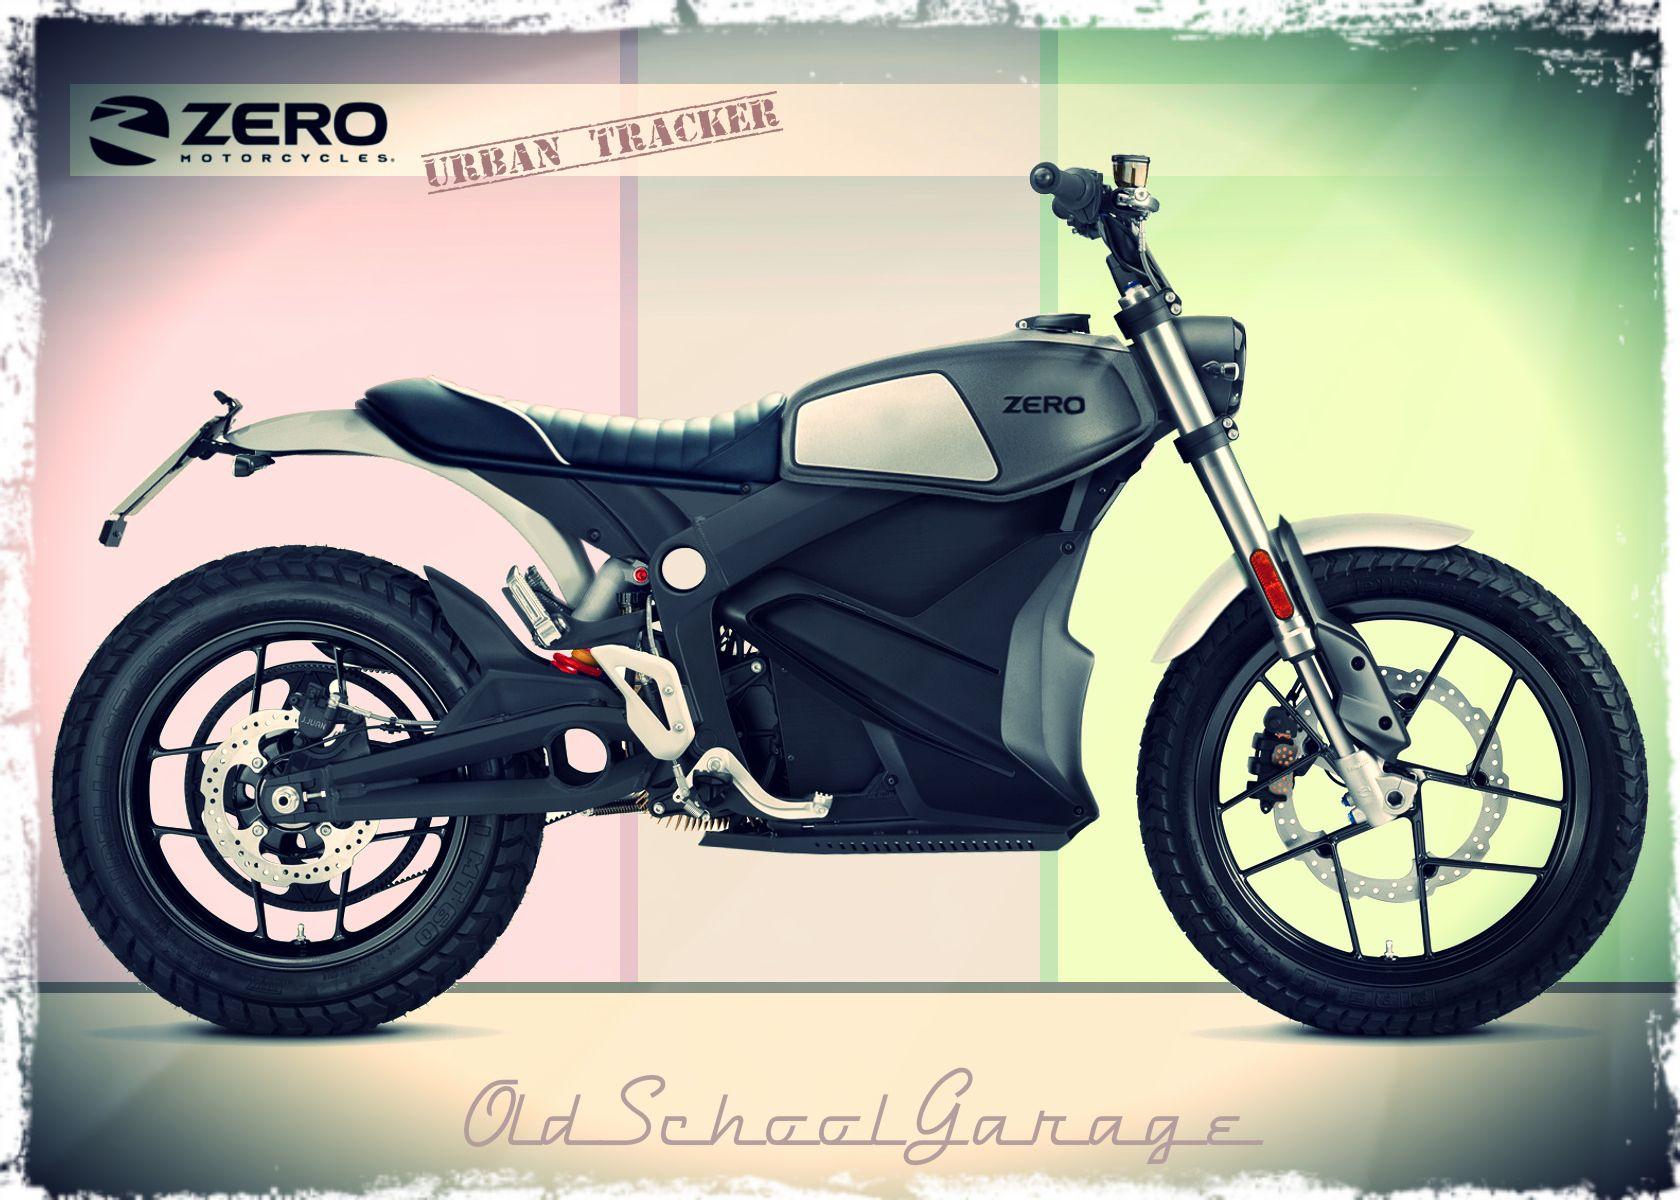 ELETTRIC MOTORCYCLES # URBAN MOBILITY # SPECIAL SCRAMBLER # ZERO MOTORCYCLES